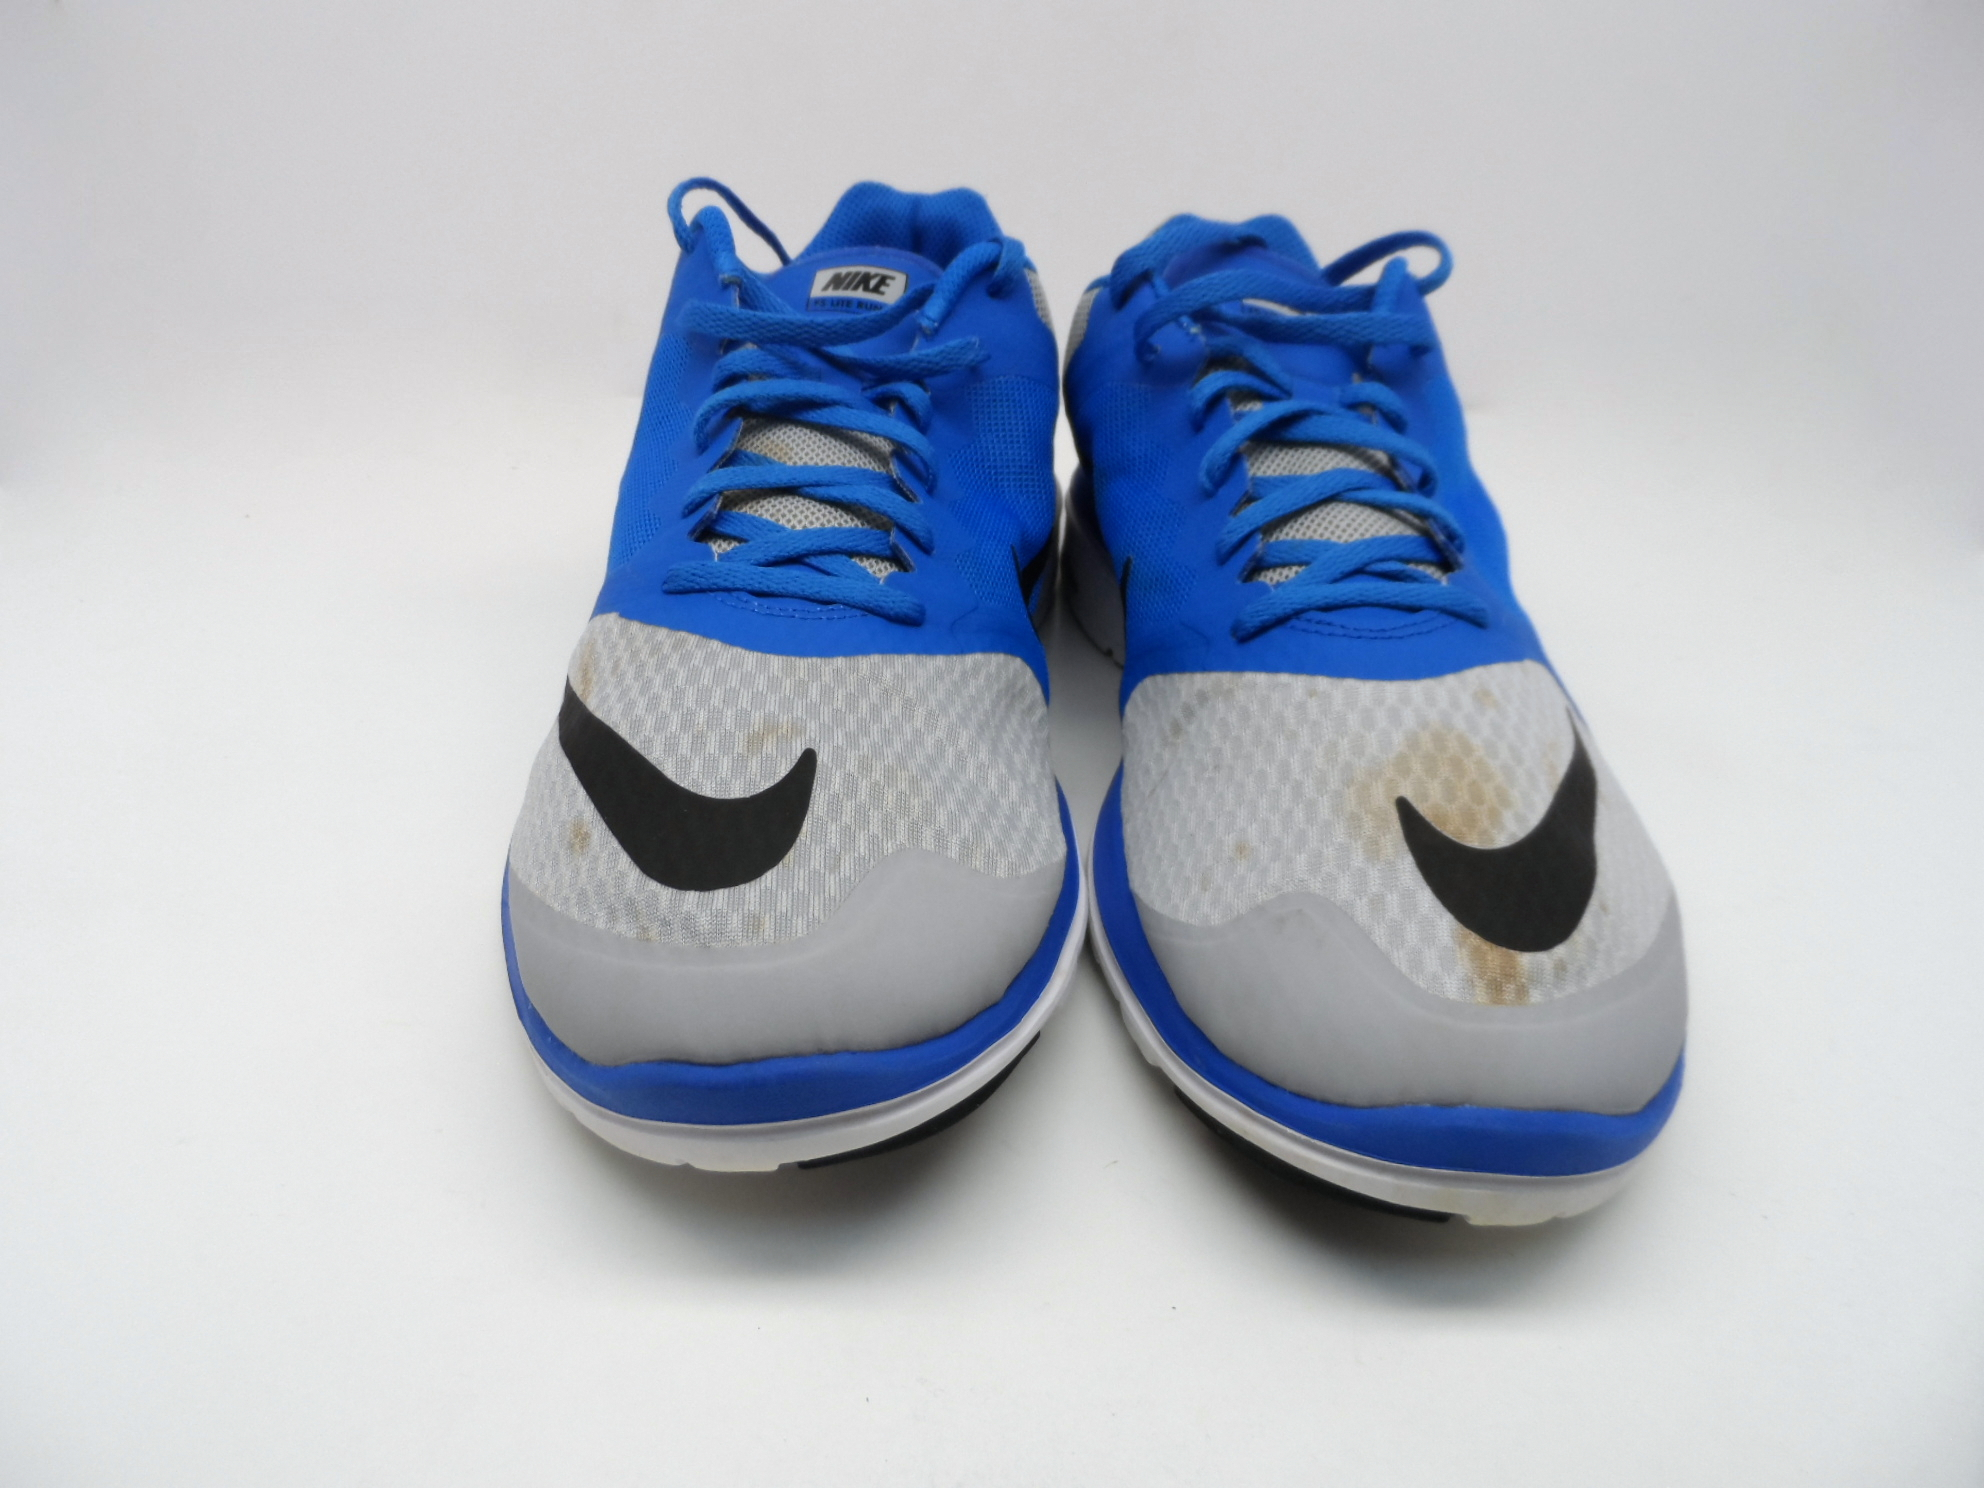 Nike Men's FS Lite Run 3 Running Shoe Blue/Grey Size 12 ...